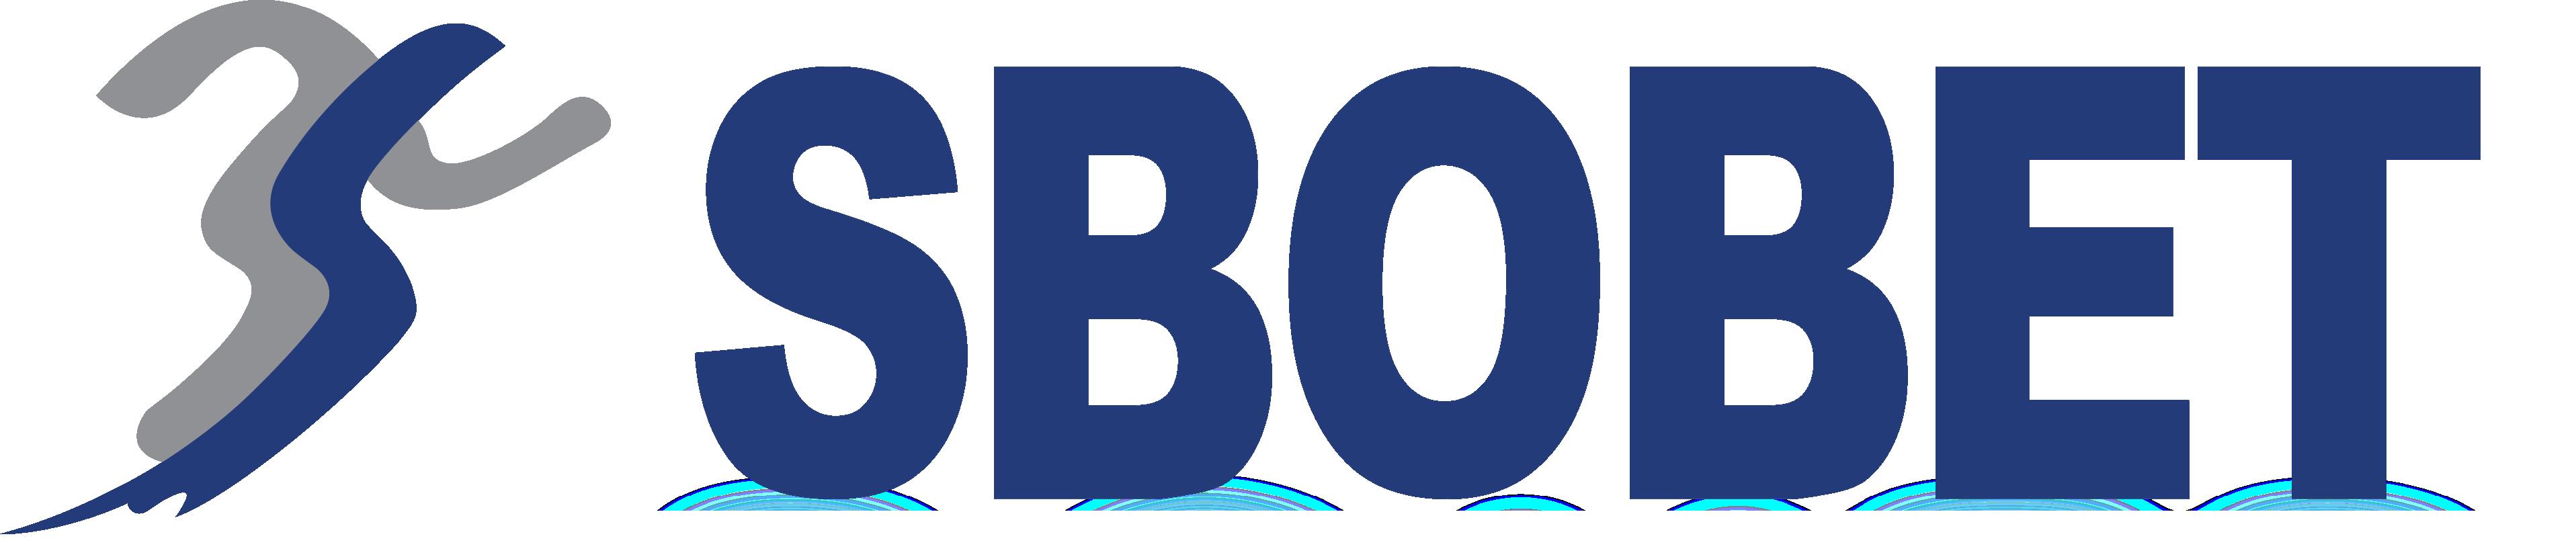 sbobet-logo